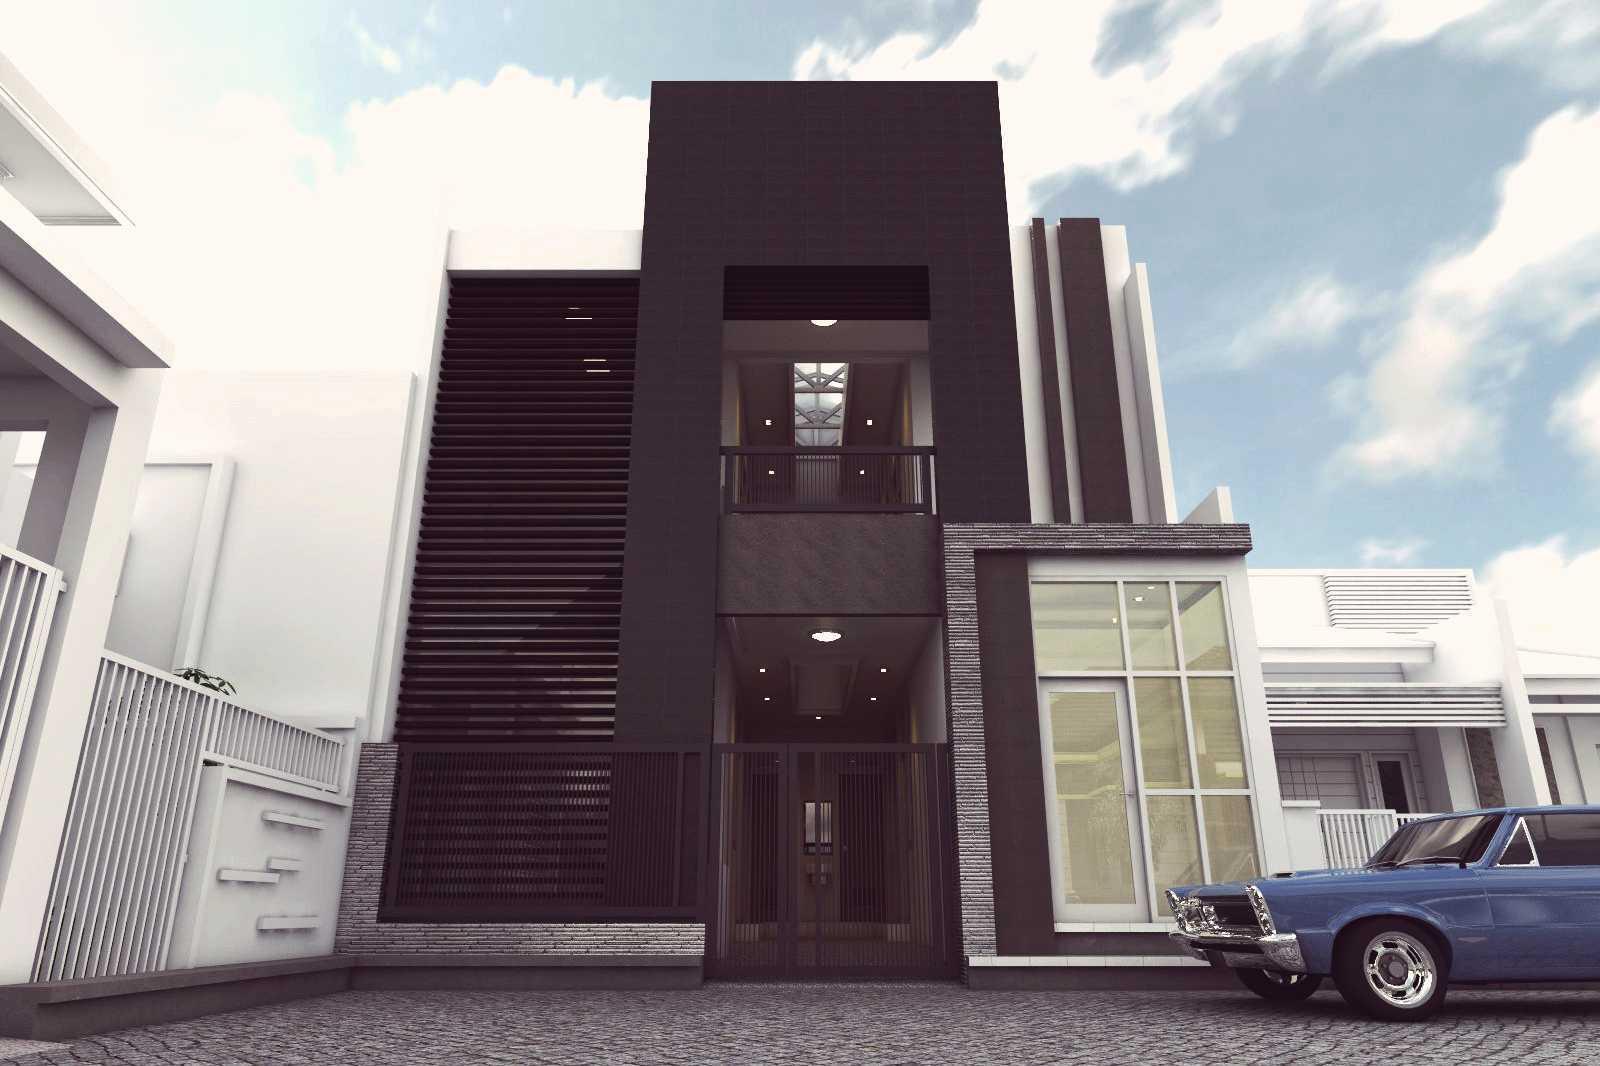 Muda Arsitek Rahmat's Boarding House Surabaya, Kota Sby, Jawa Timur, Indonesia Surabaya, Kota Sby, Jawa Timur, Indonesia Muda-Arsitek-Rahmats-Boarding-House  97709